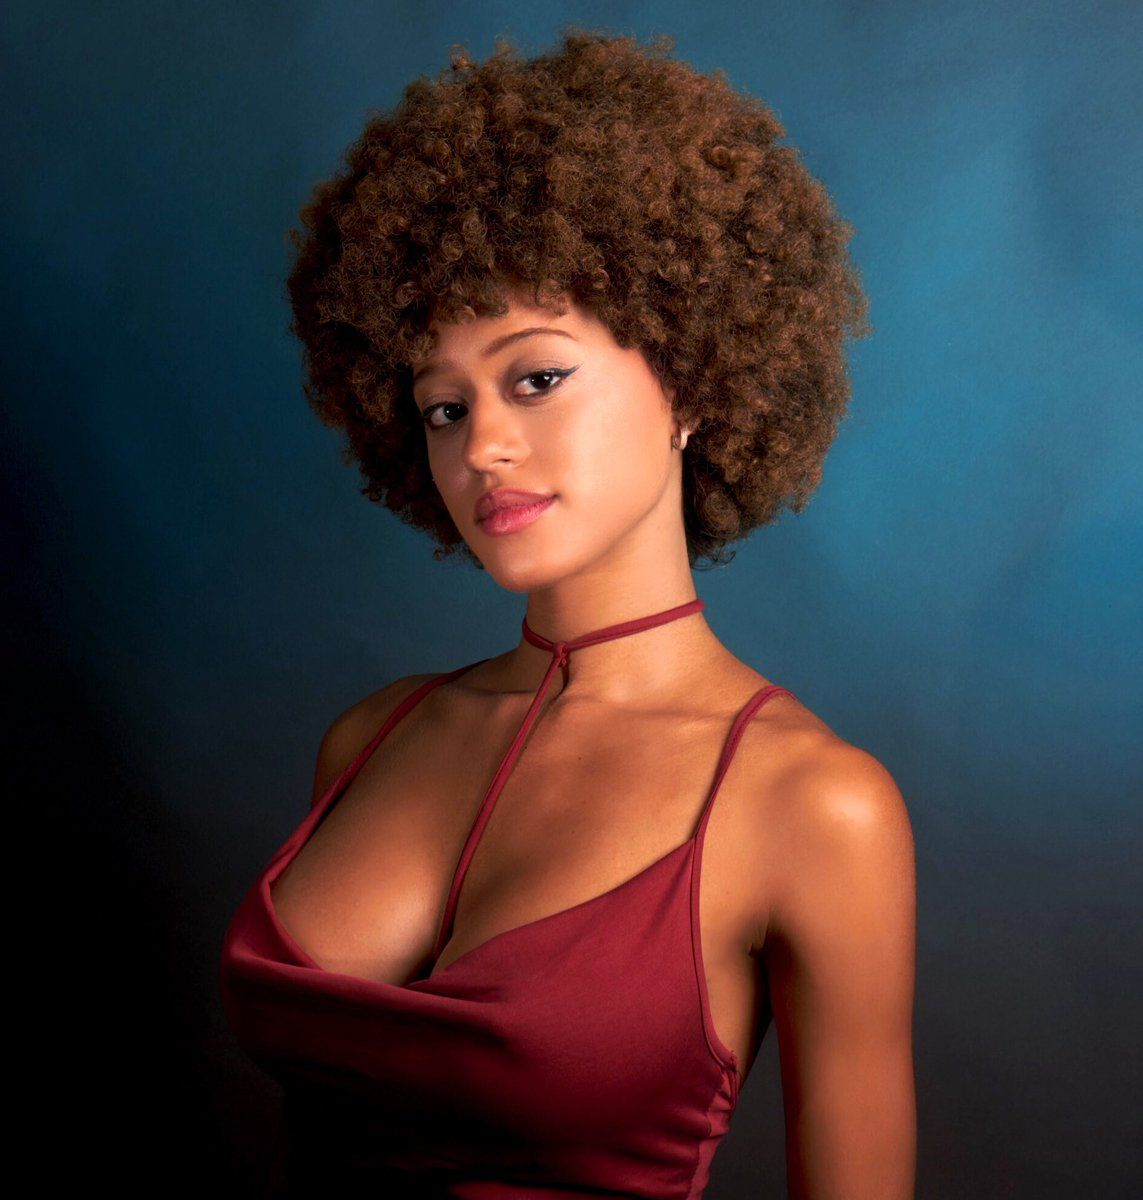 Celebrites Stormi Maya Alvarado nude (92 foto and video), Ass, Is a cute, Boobs, cameltoe 2017